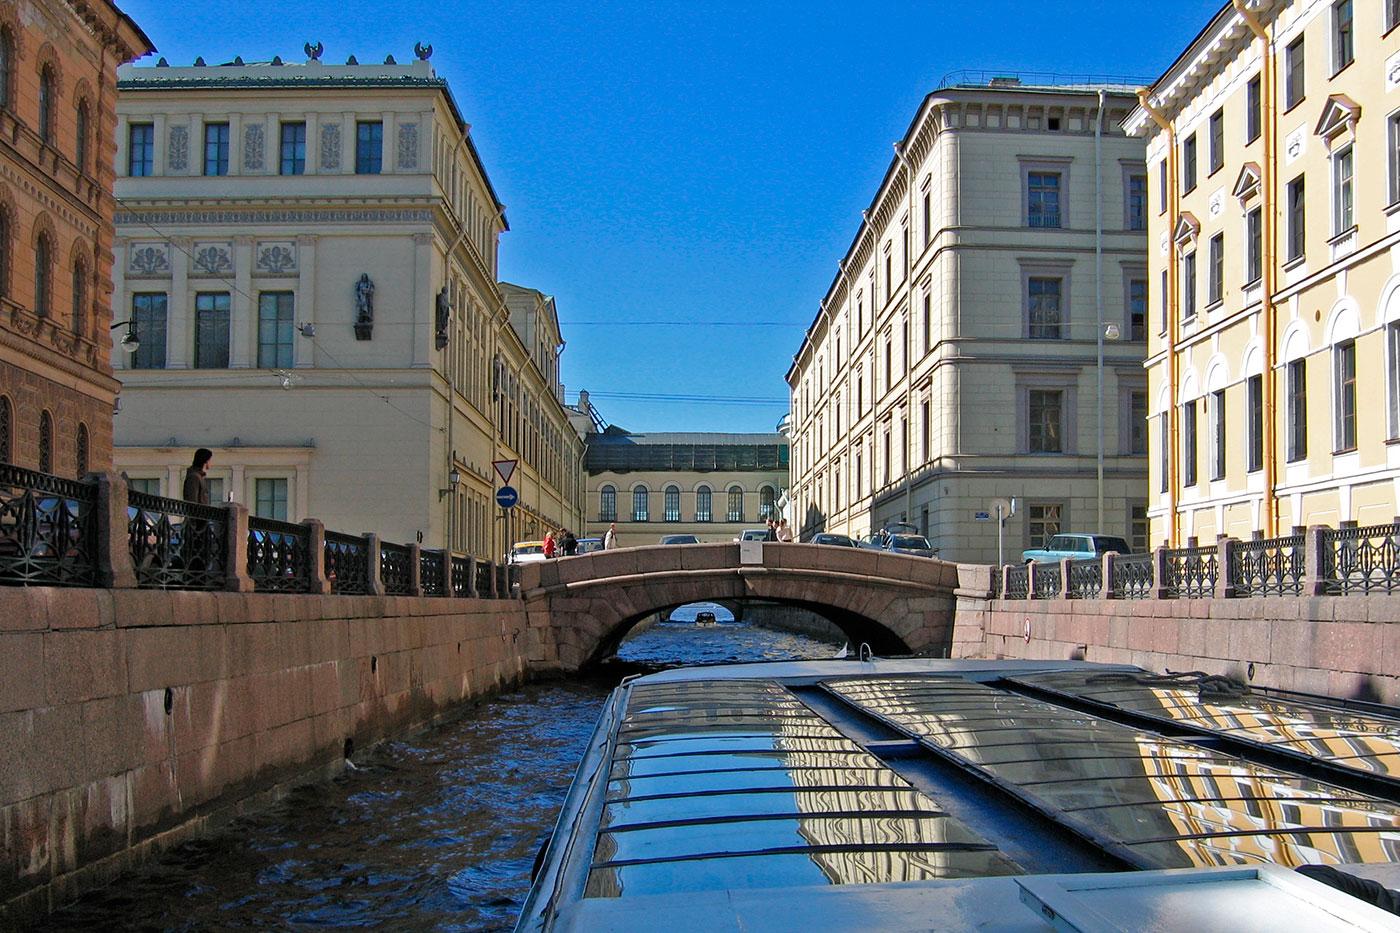 Зимняя канавка, Санкт-Петербург